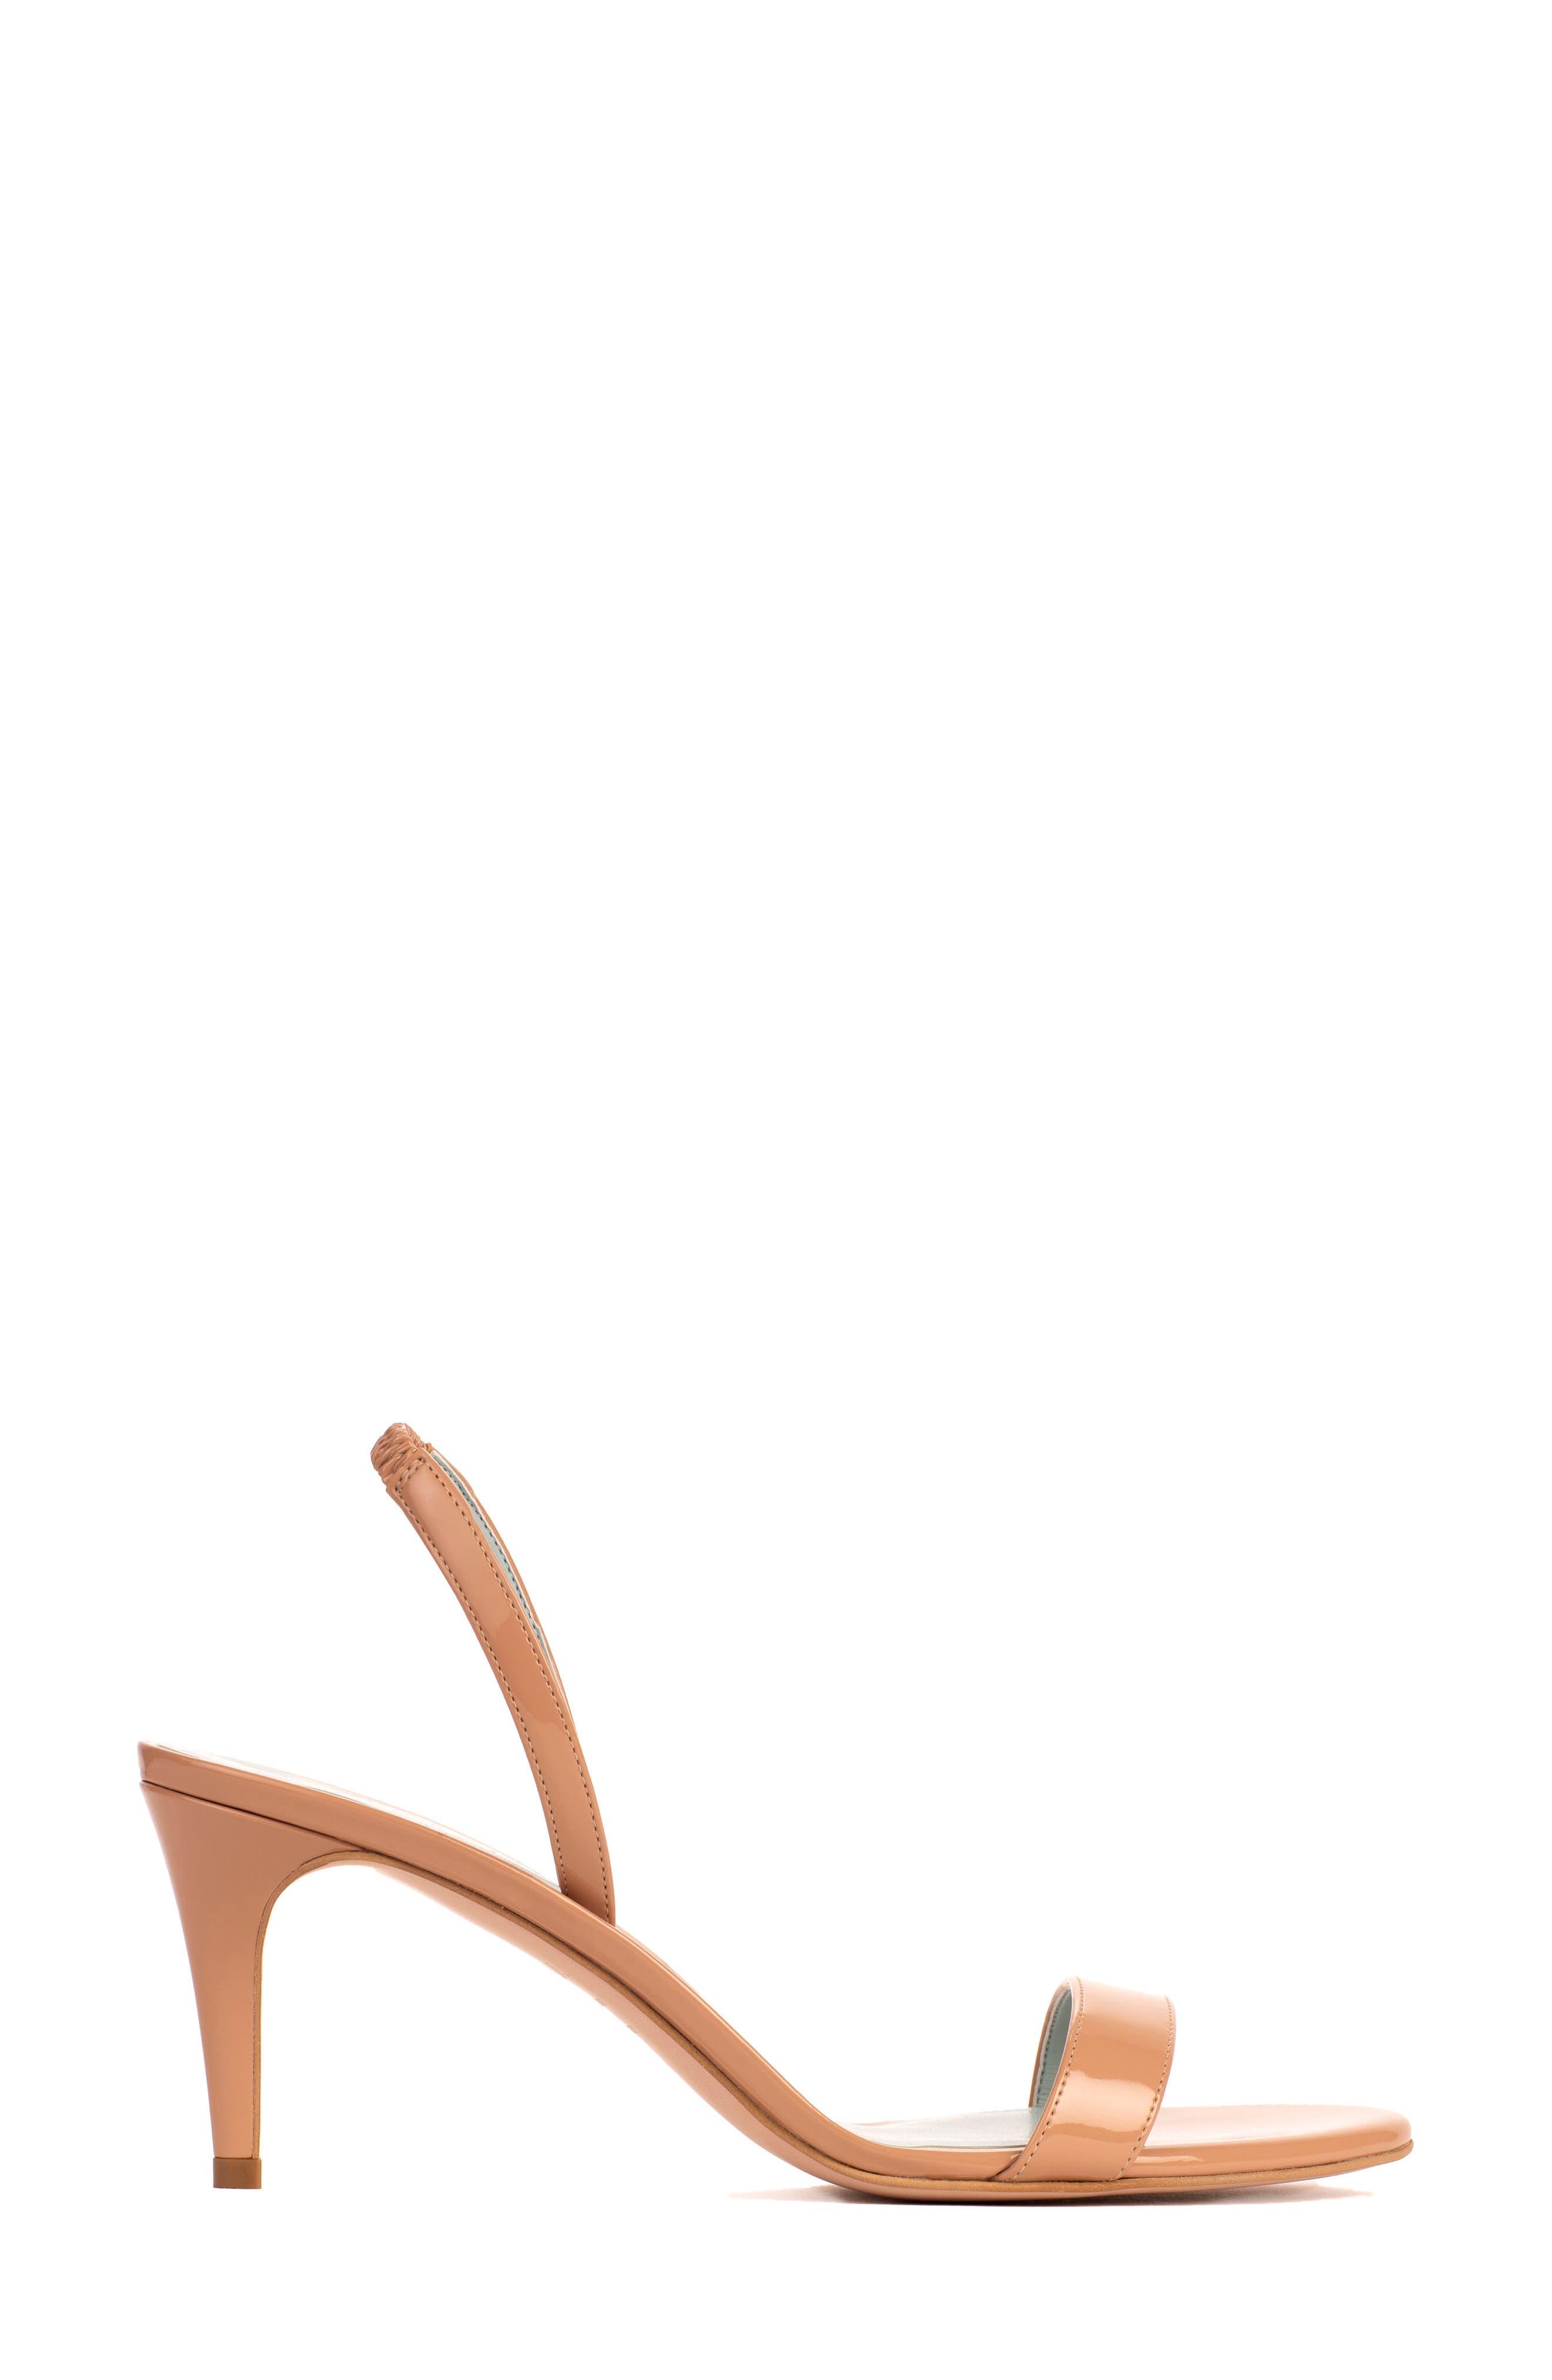 Sally Ankle Strap Sandal